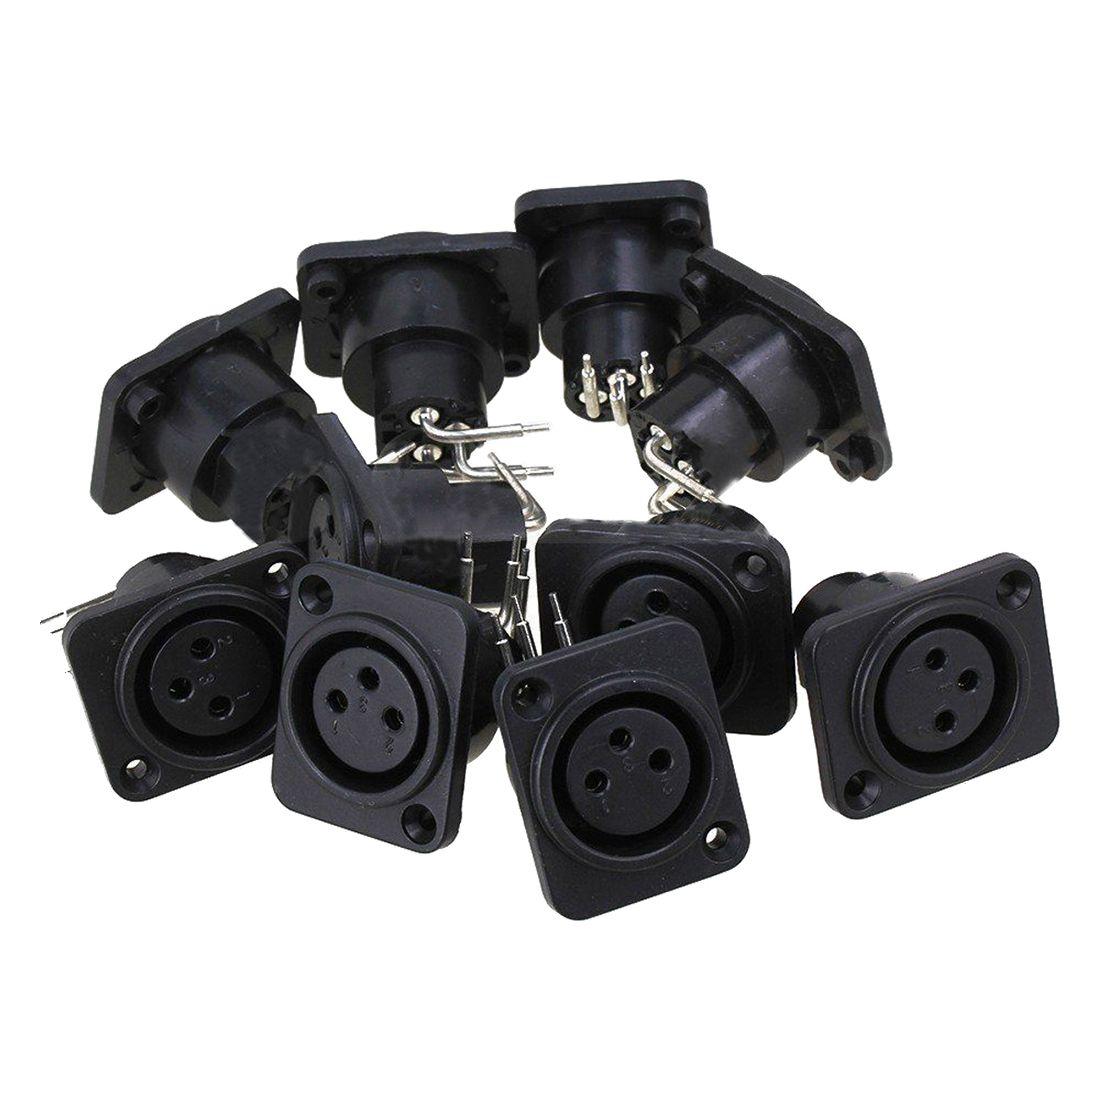 10 pcs Preto XLR 3pin Feminino Jack Panel Mount Chassis PCB Soquete do Conector